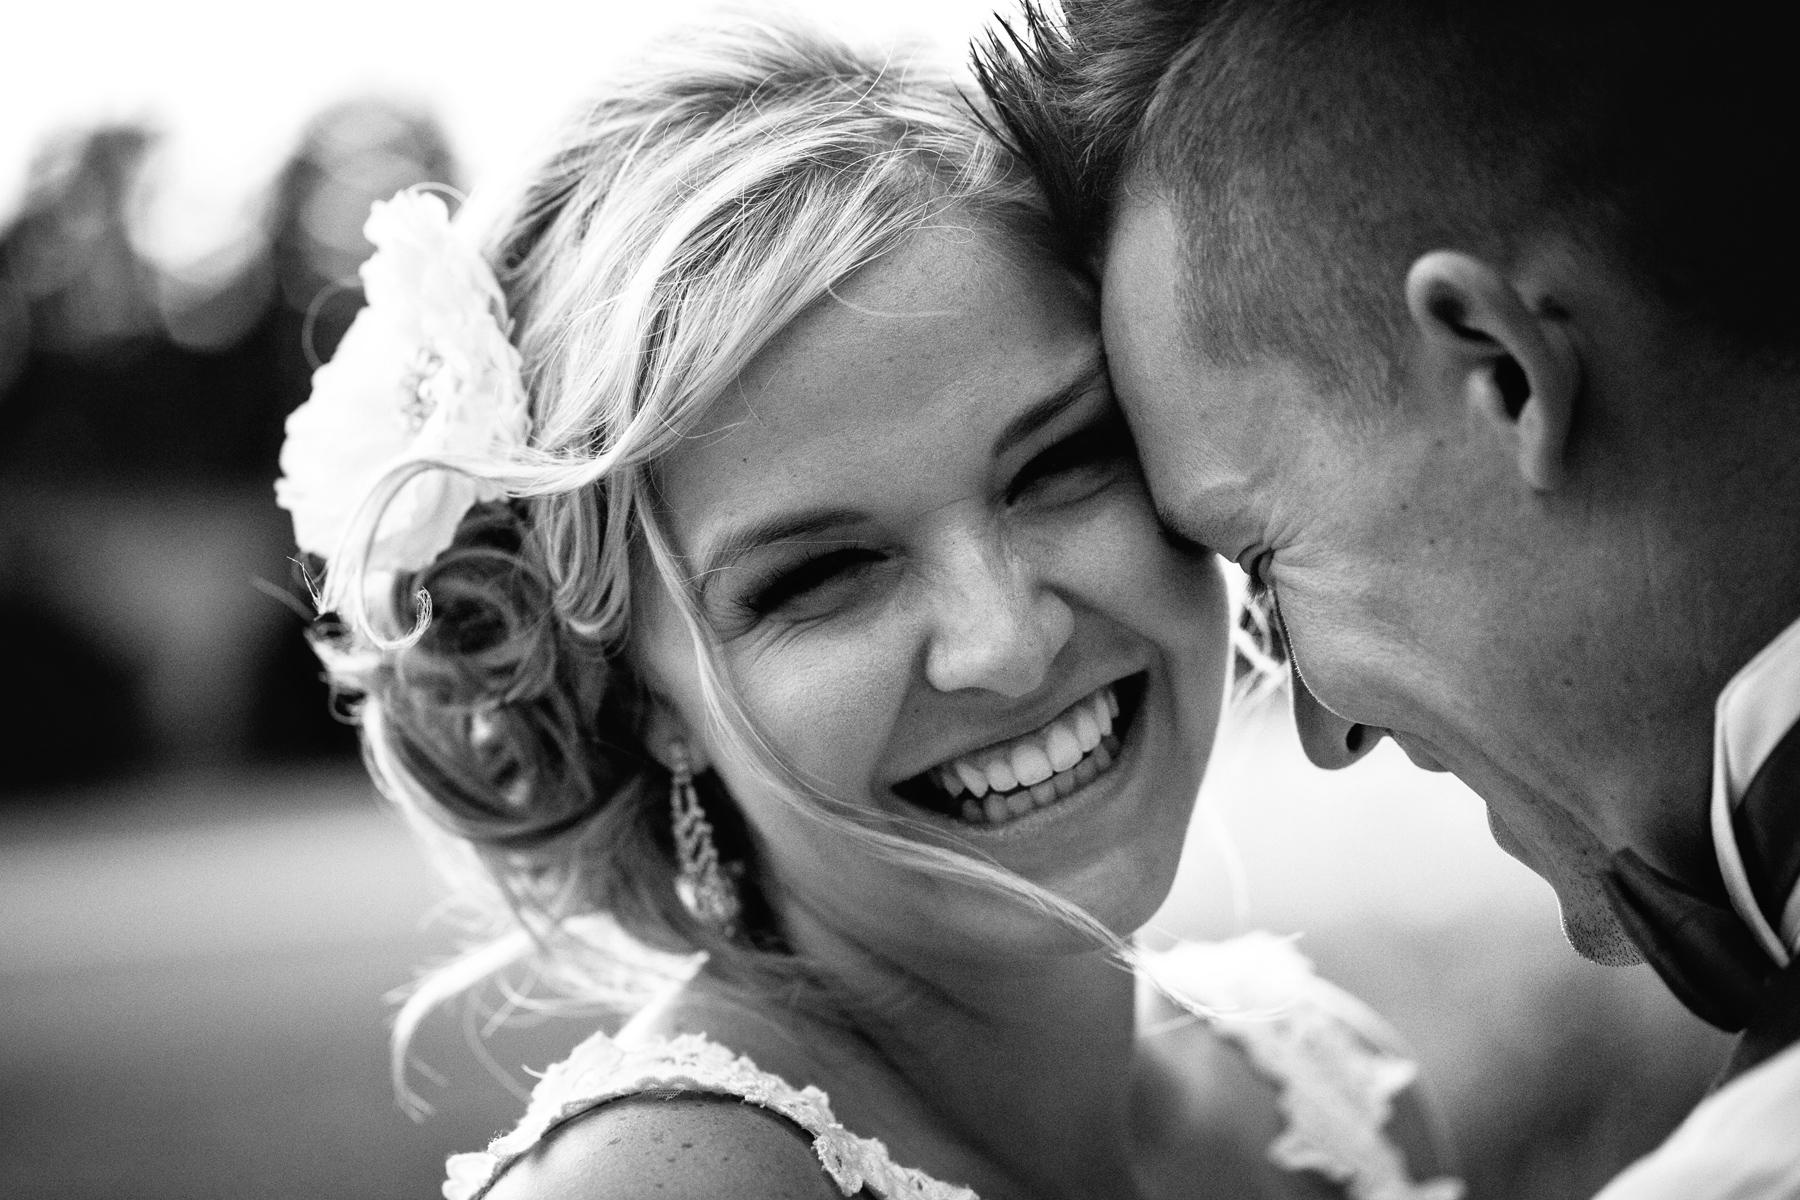 062-awesome-pei-wedding-photography-kandisebrown-jg2016